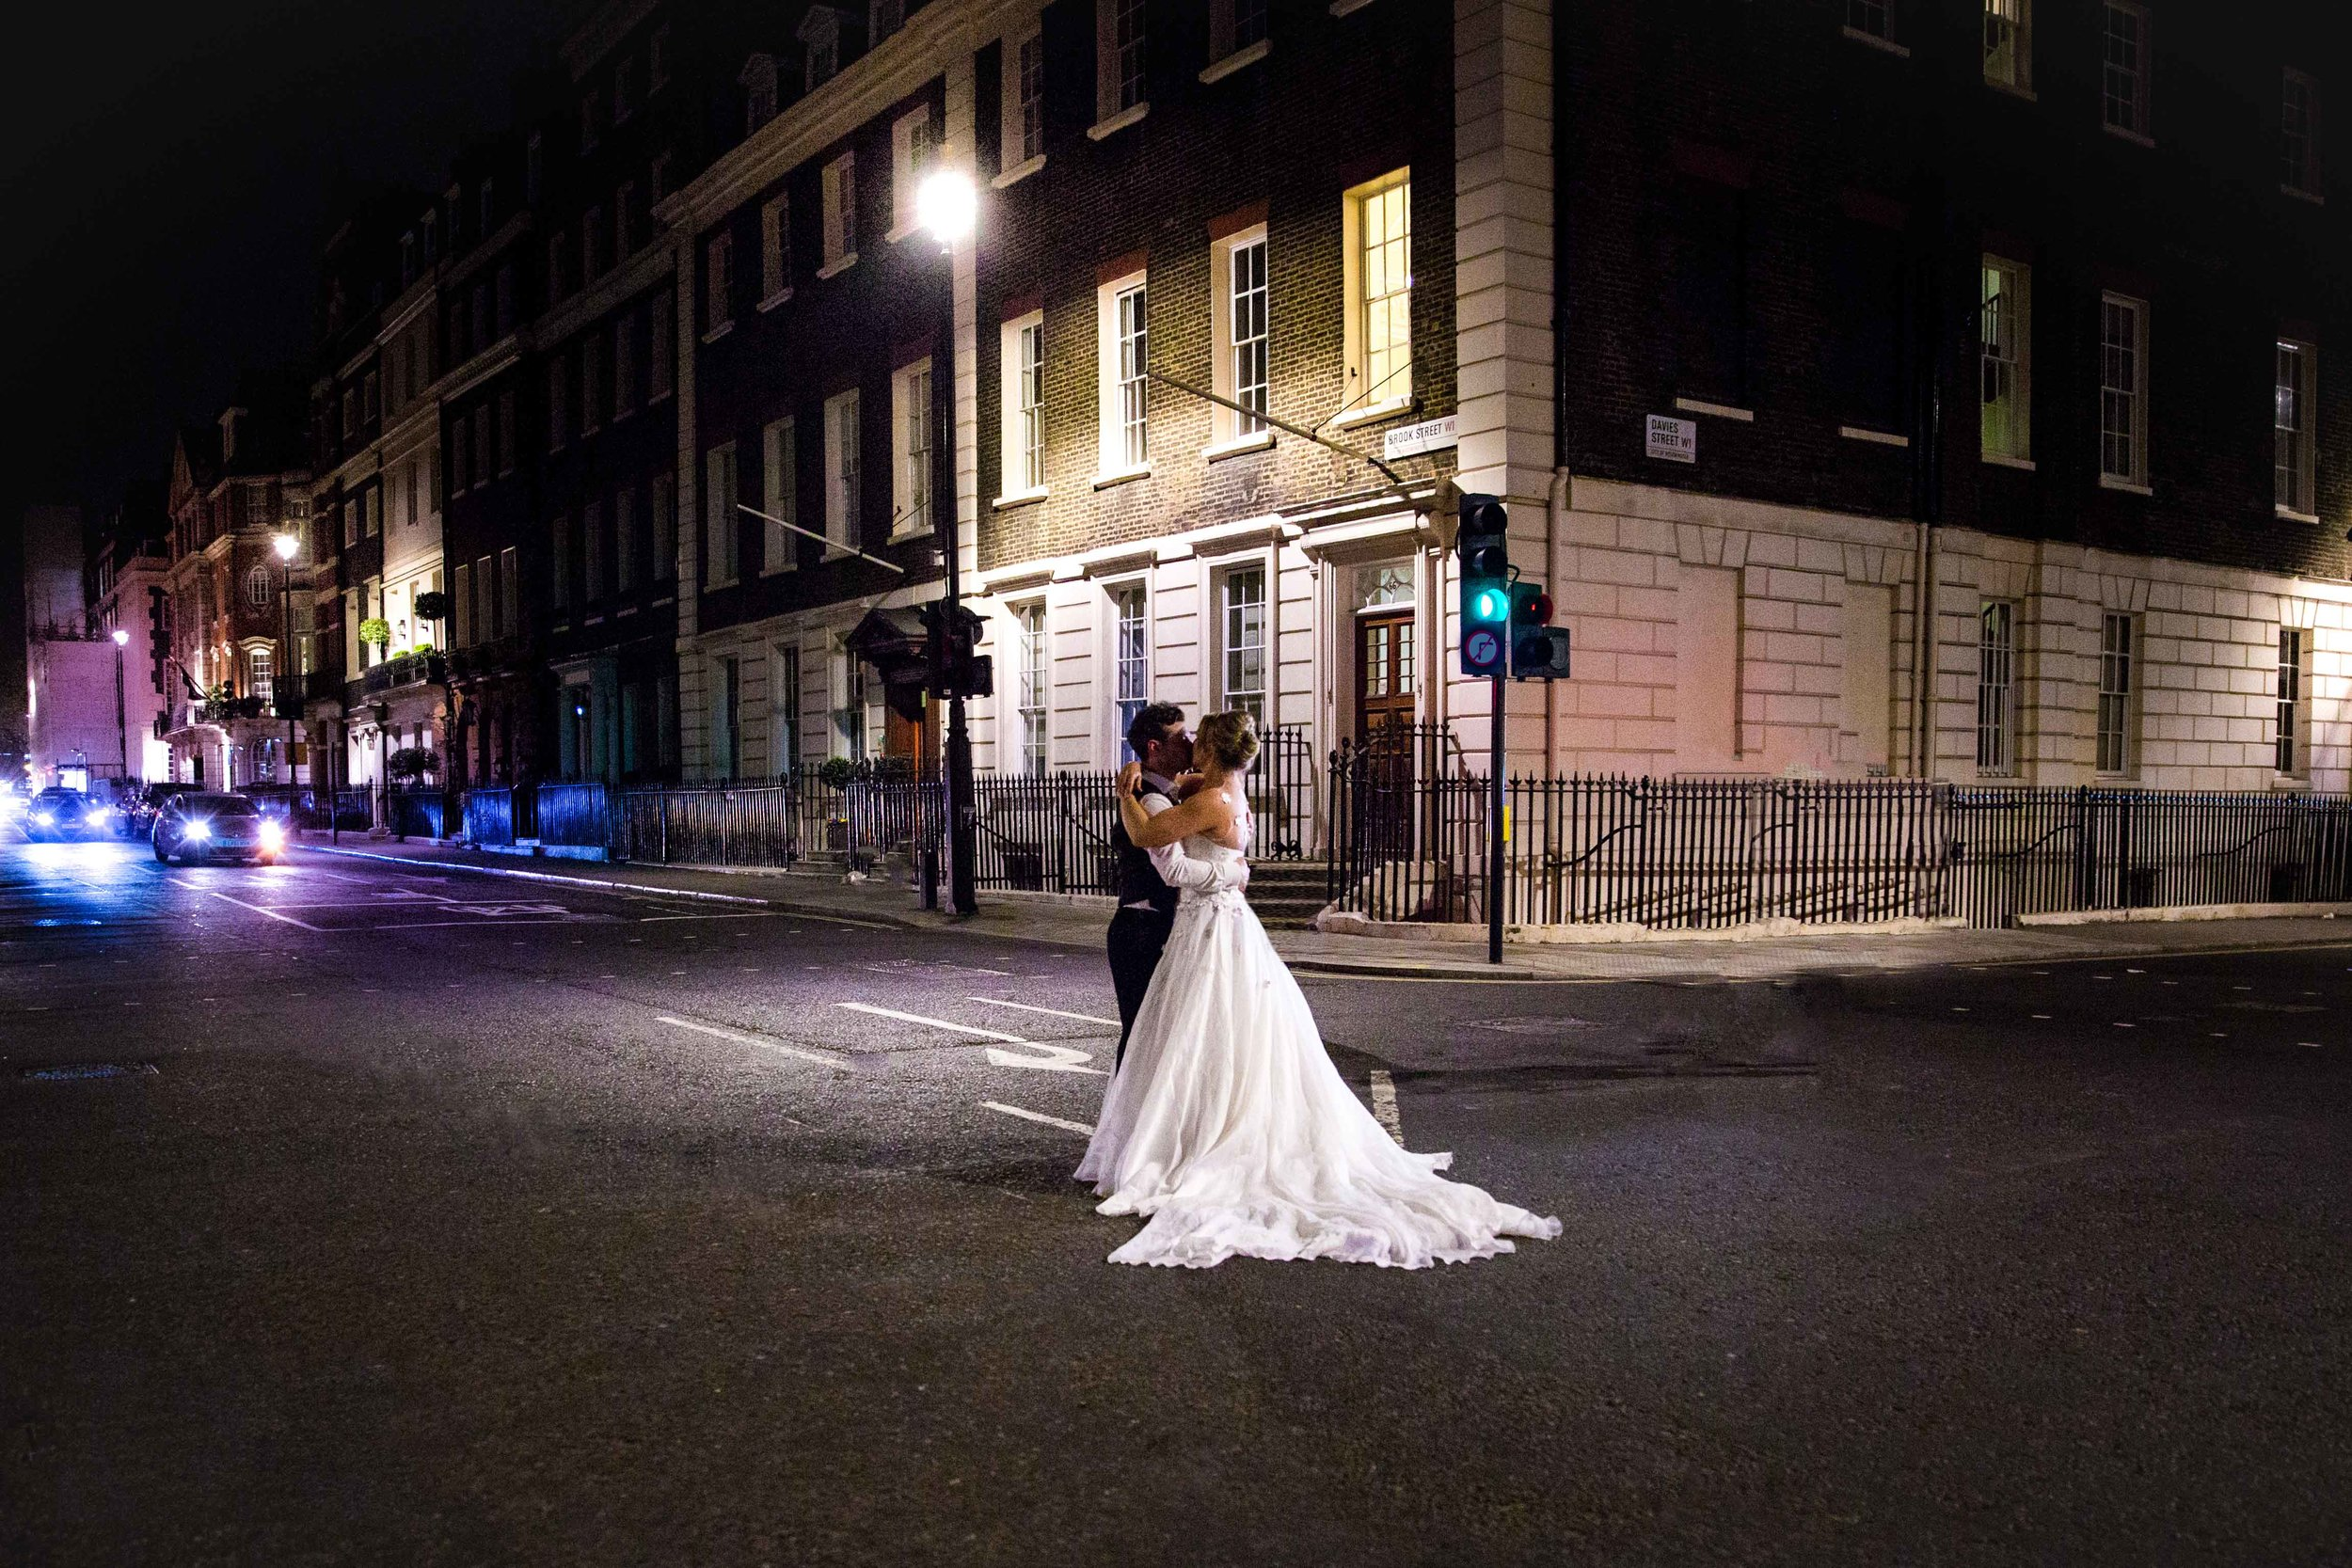 claridges-hotel-wedding-photographer-london-mayfair-natalia-smith-photography-167.jpg